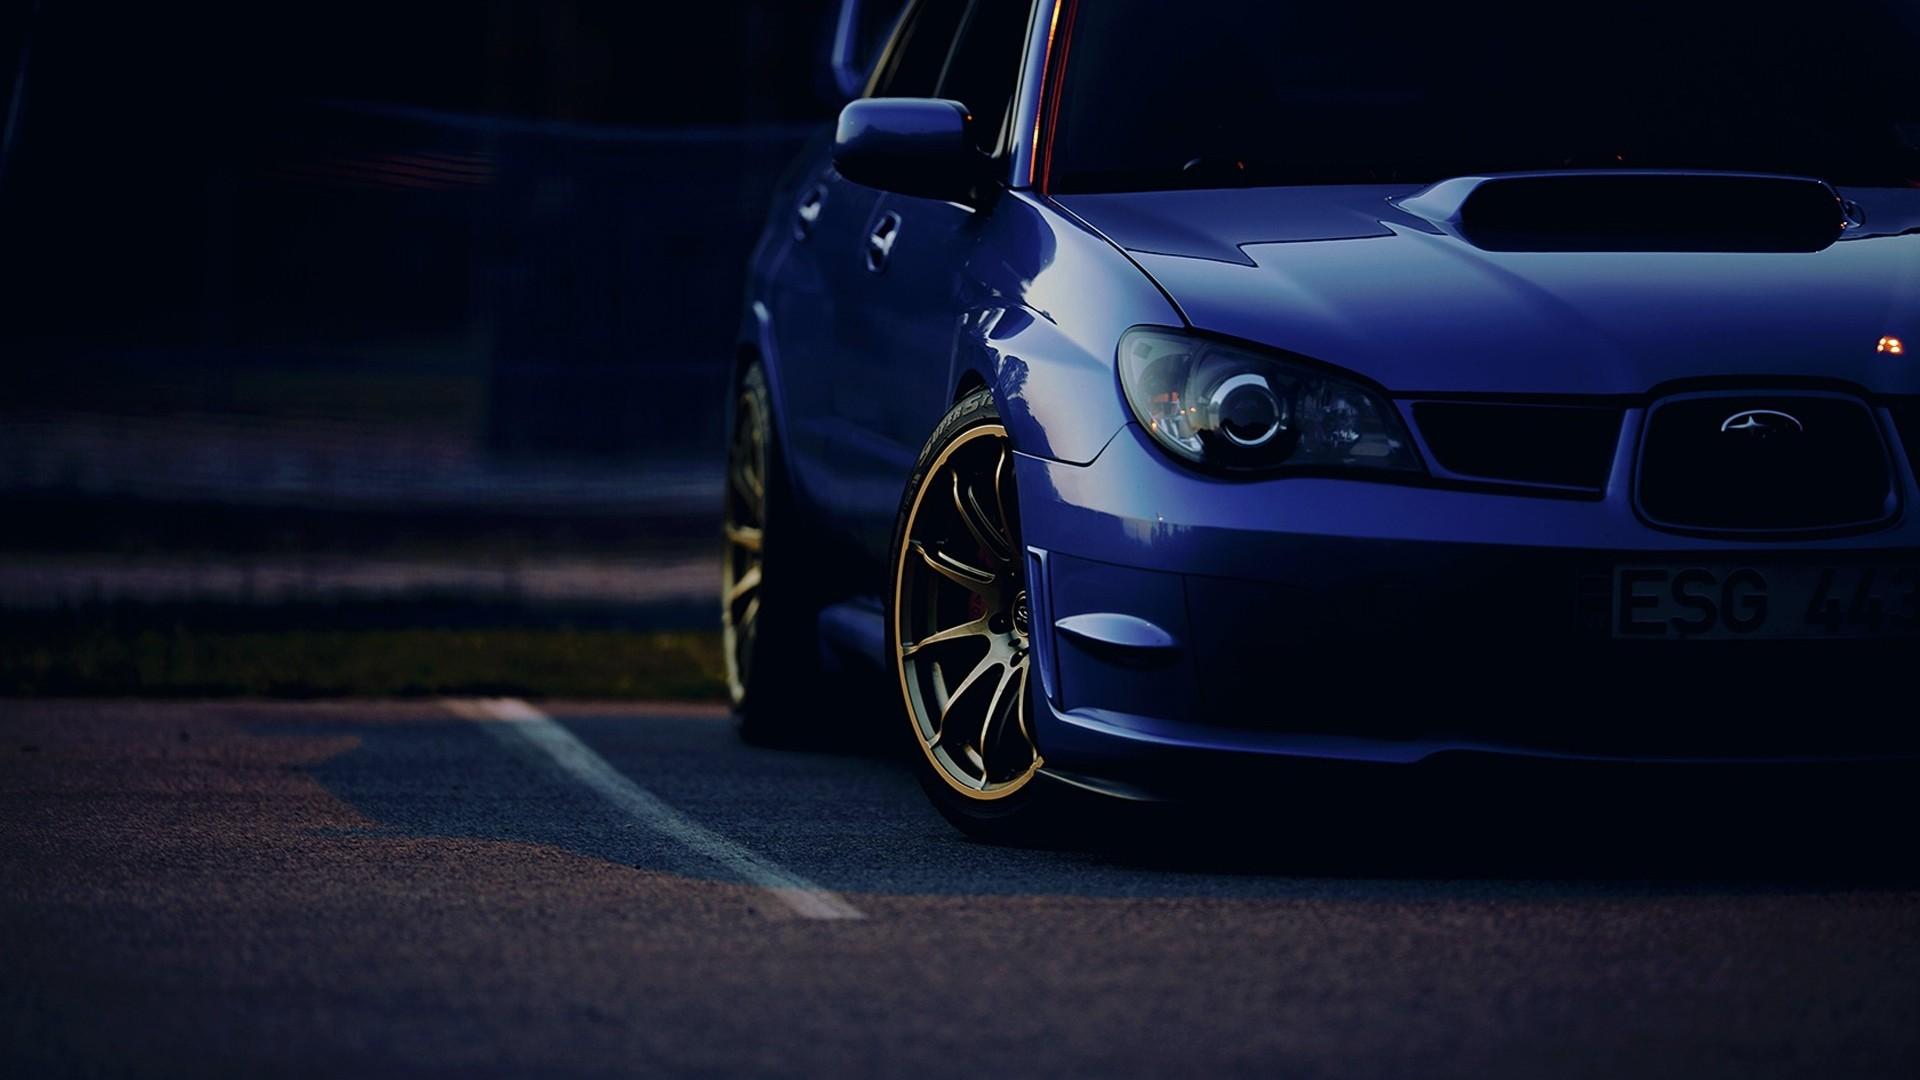 Subaru WRX Wallpaper HD on WallpaperSafari